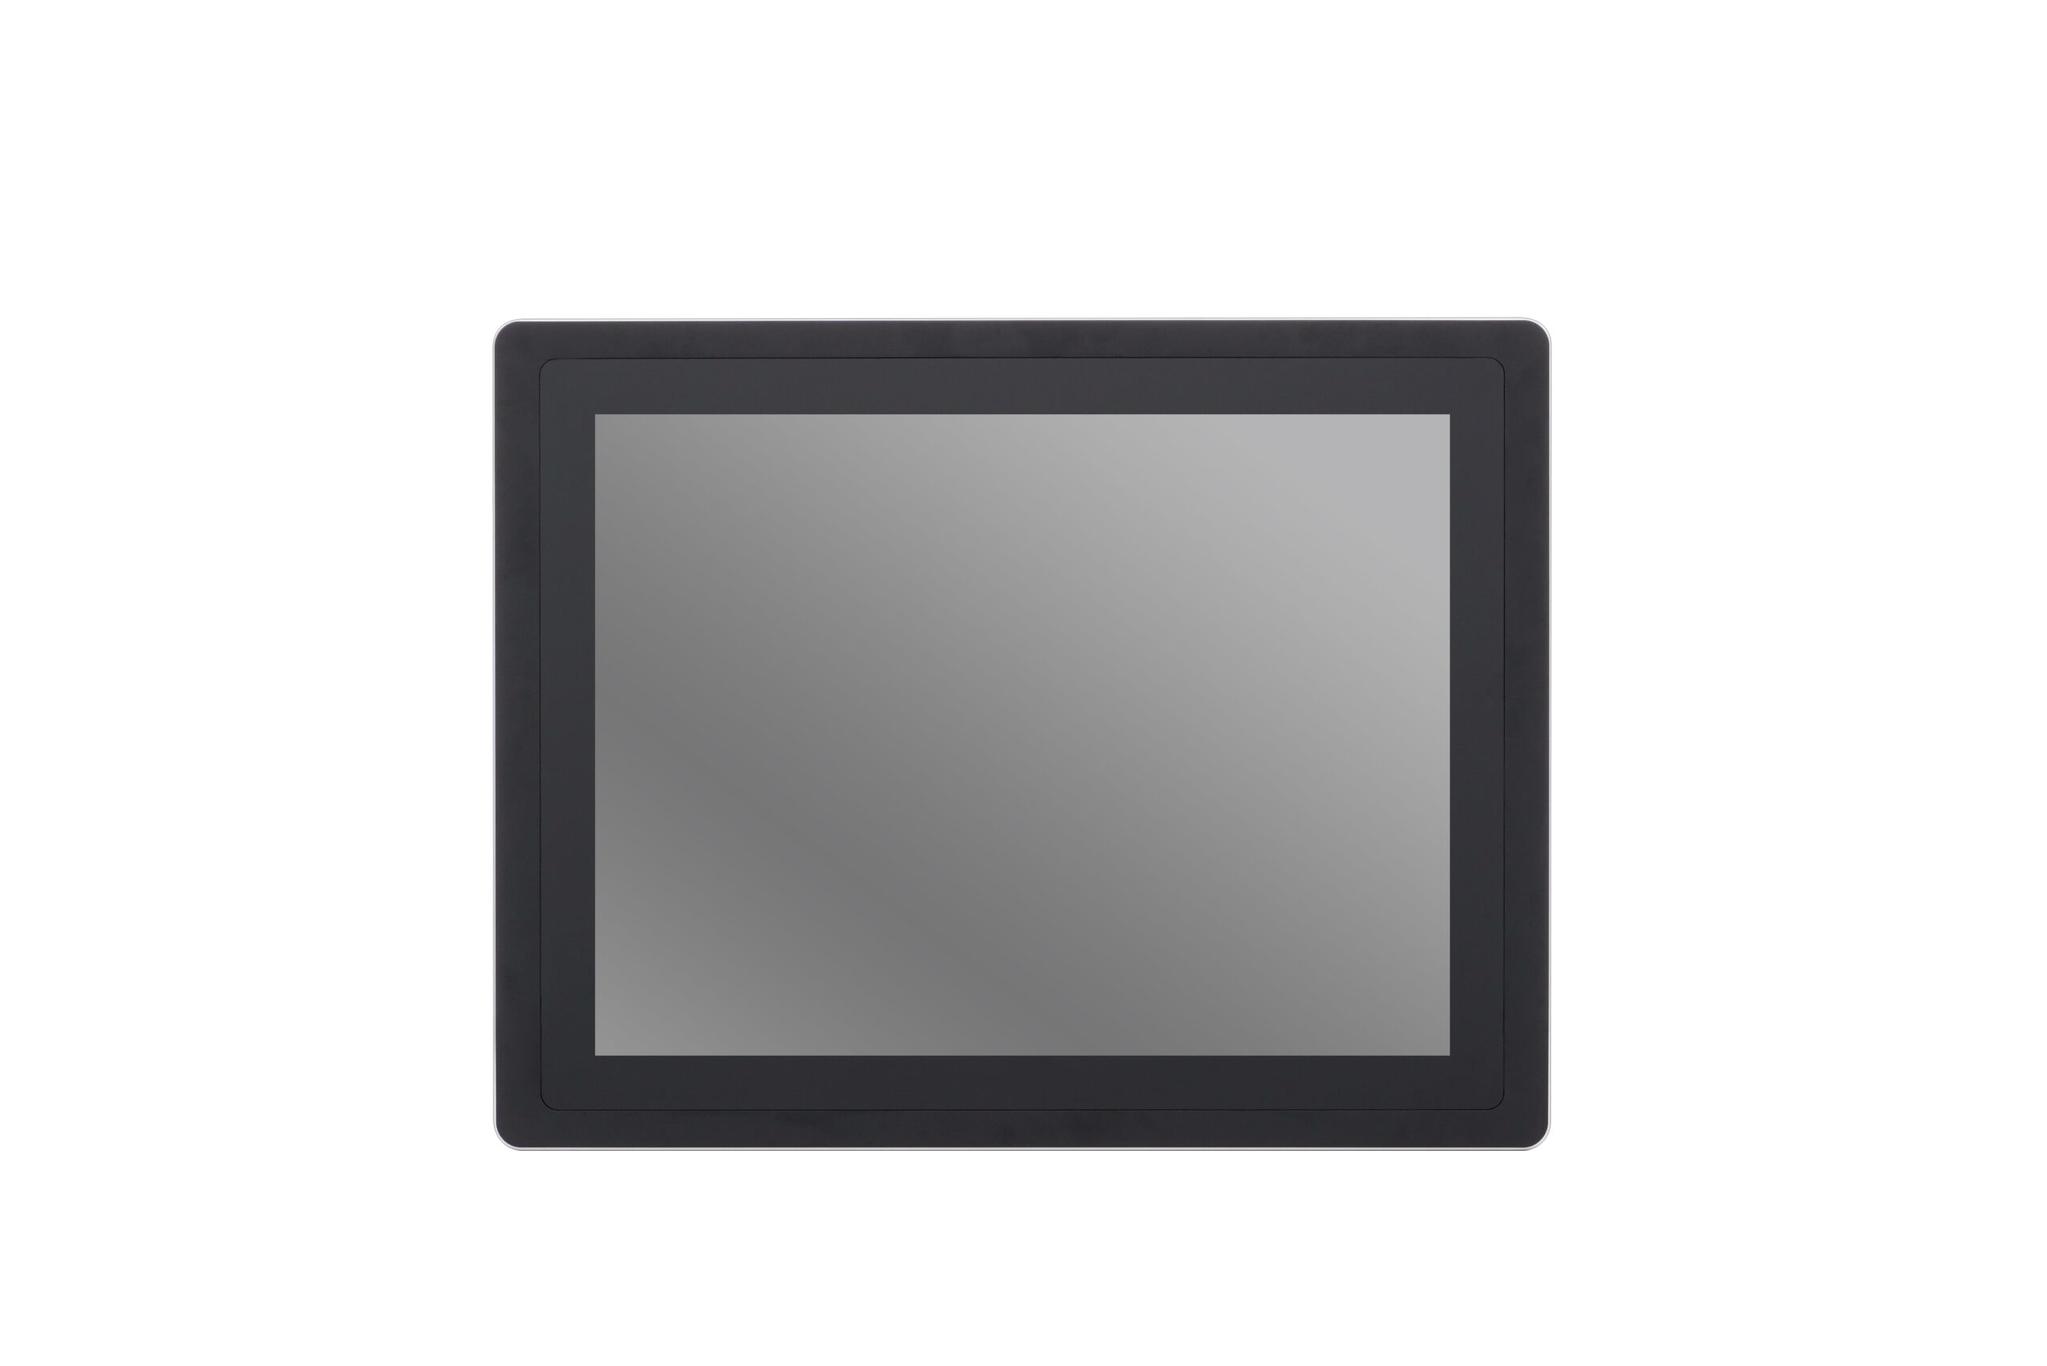 15,6 inch  True Flat touch screen computer | Resun EB-156SY